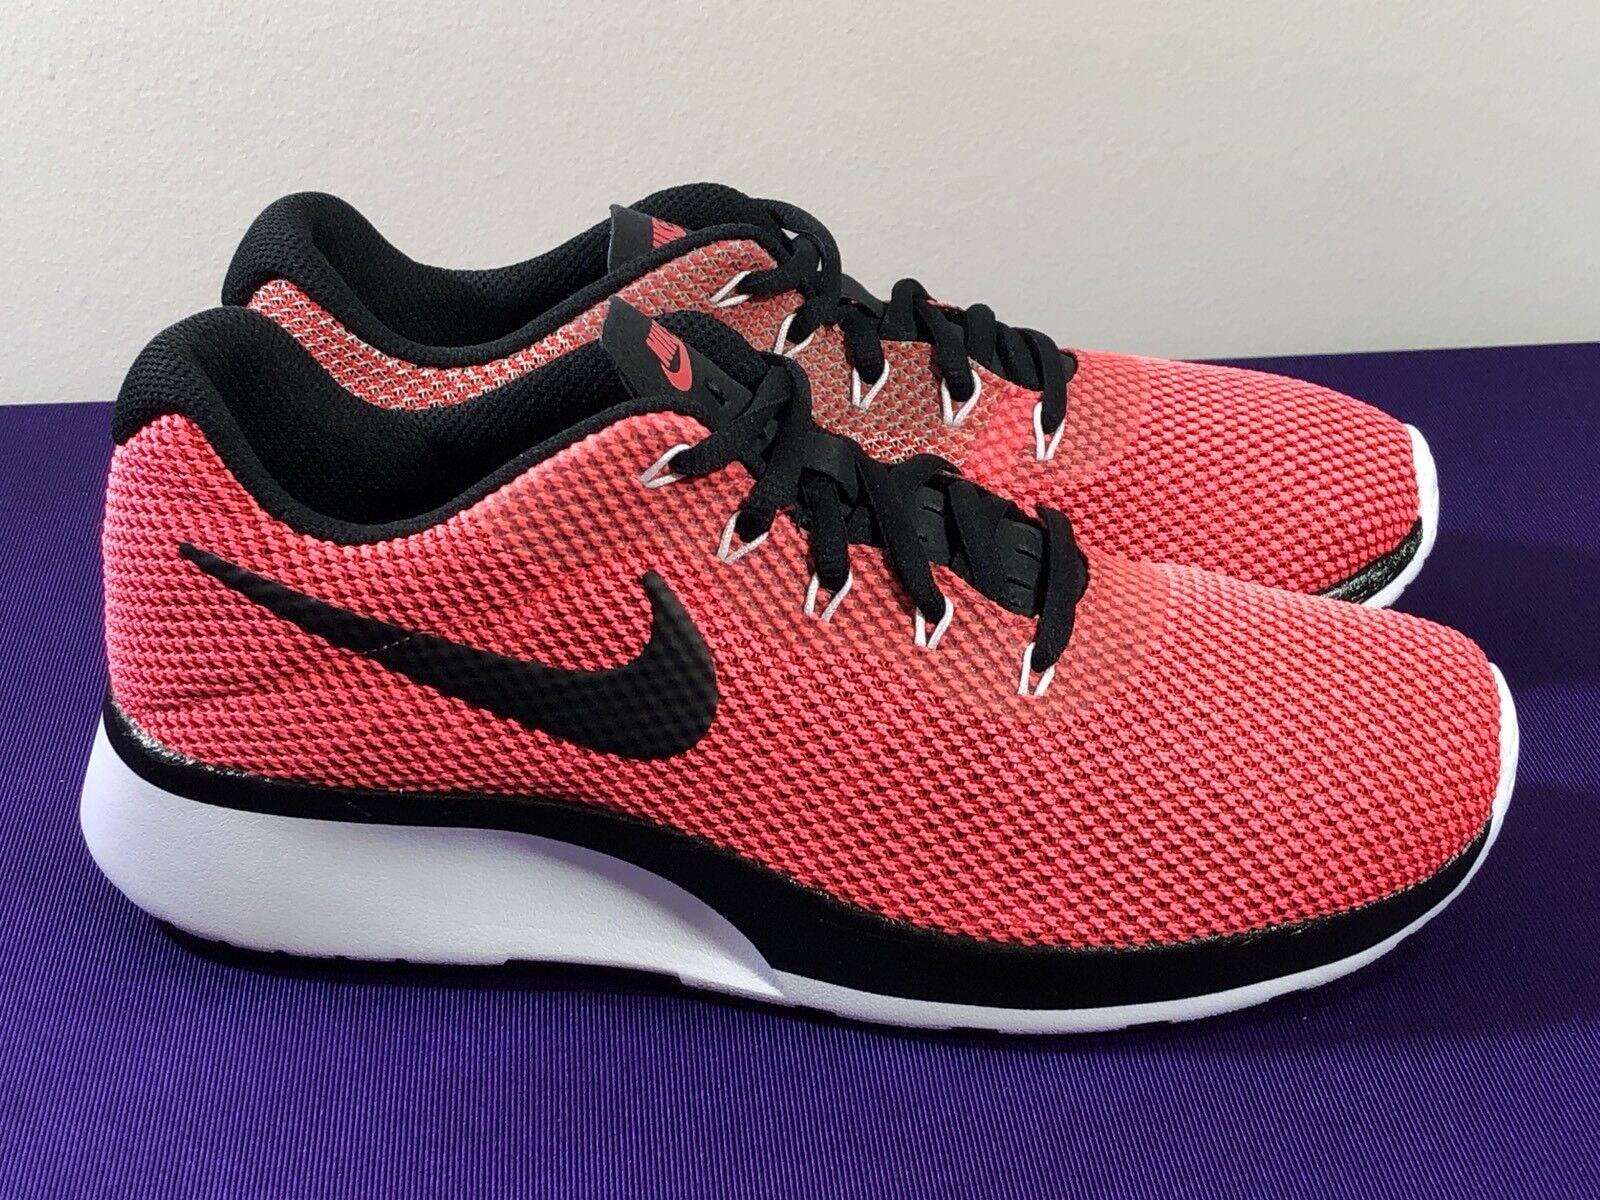 Nike Tanjun Racer Womens 921668-601 Tropical Pink Black Running Shoes Size 8.5